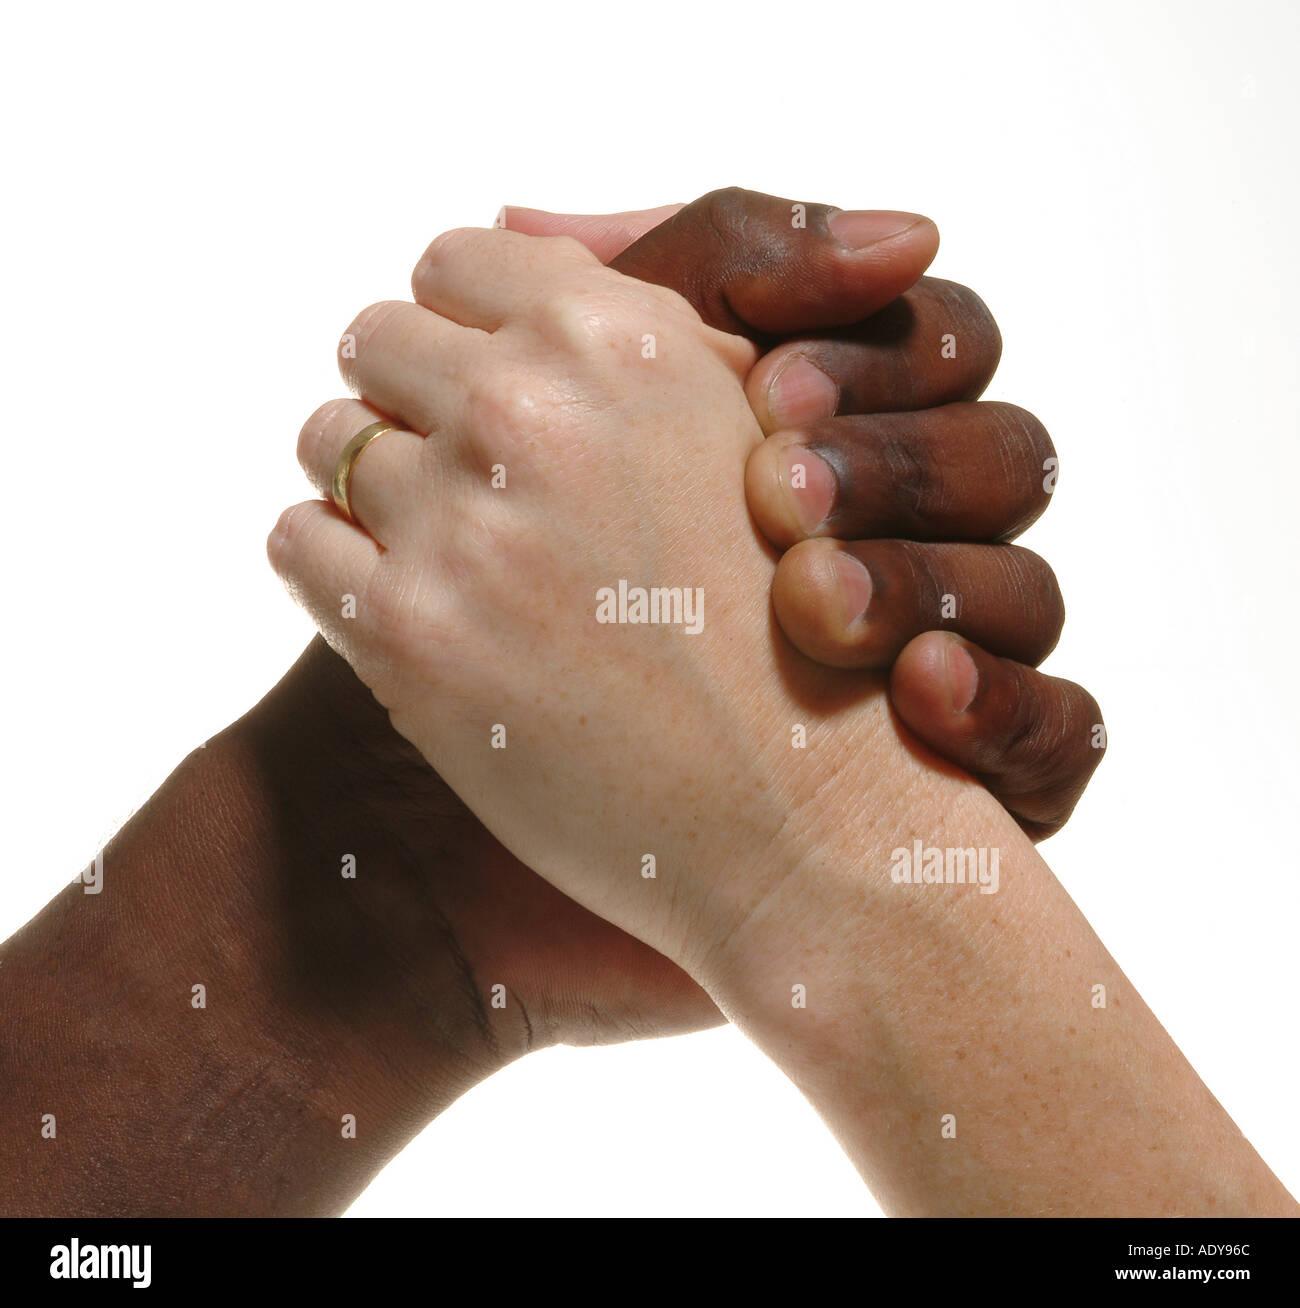 Through fist thumb